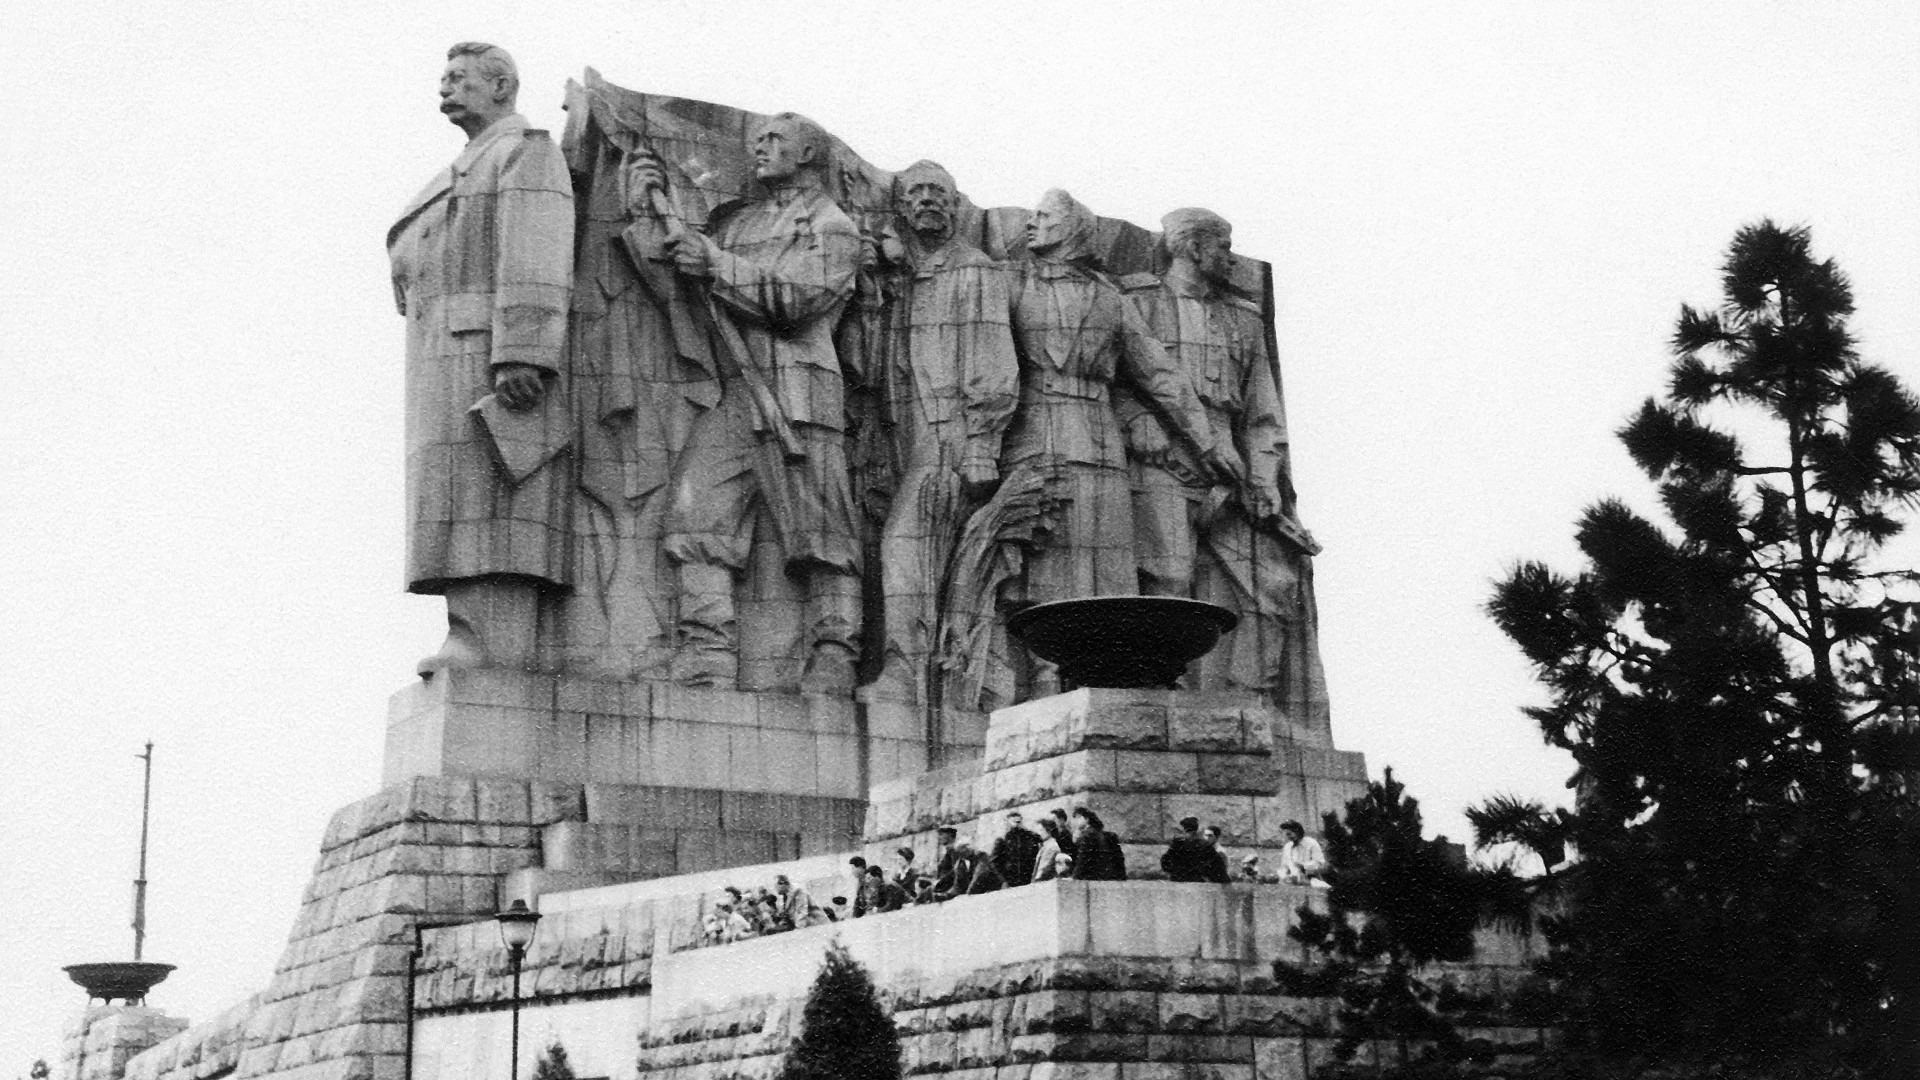 A monument to Josef Stalin in Prague, Czechoslovakia, 1956.